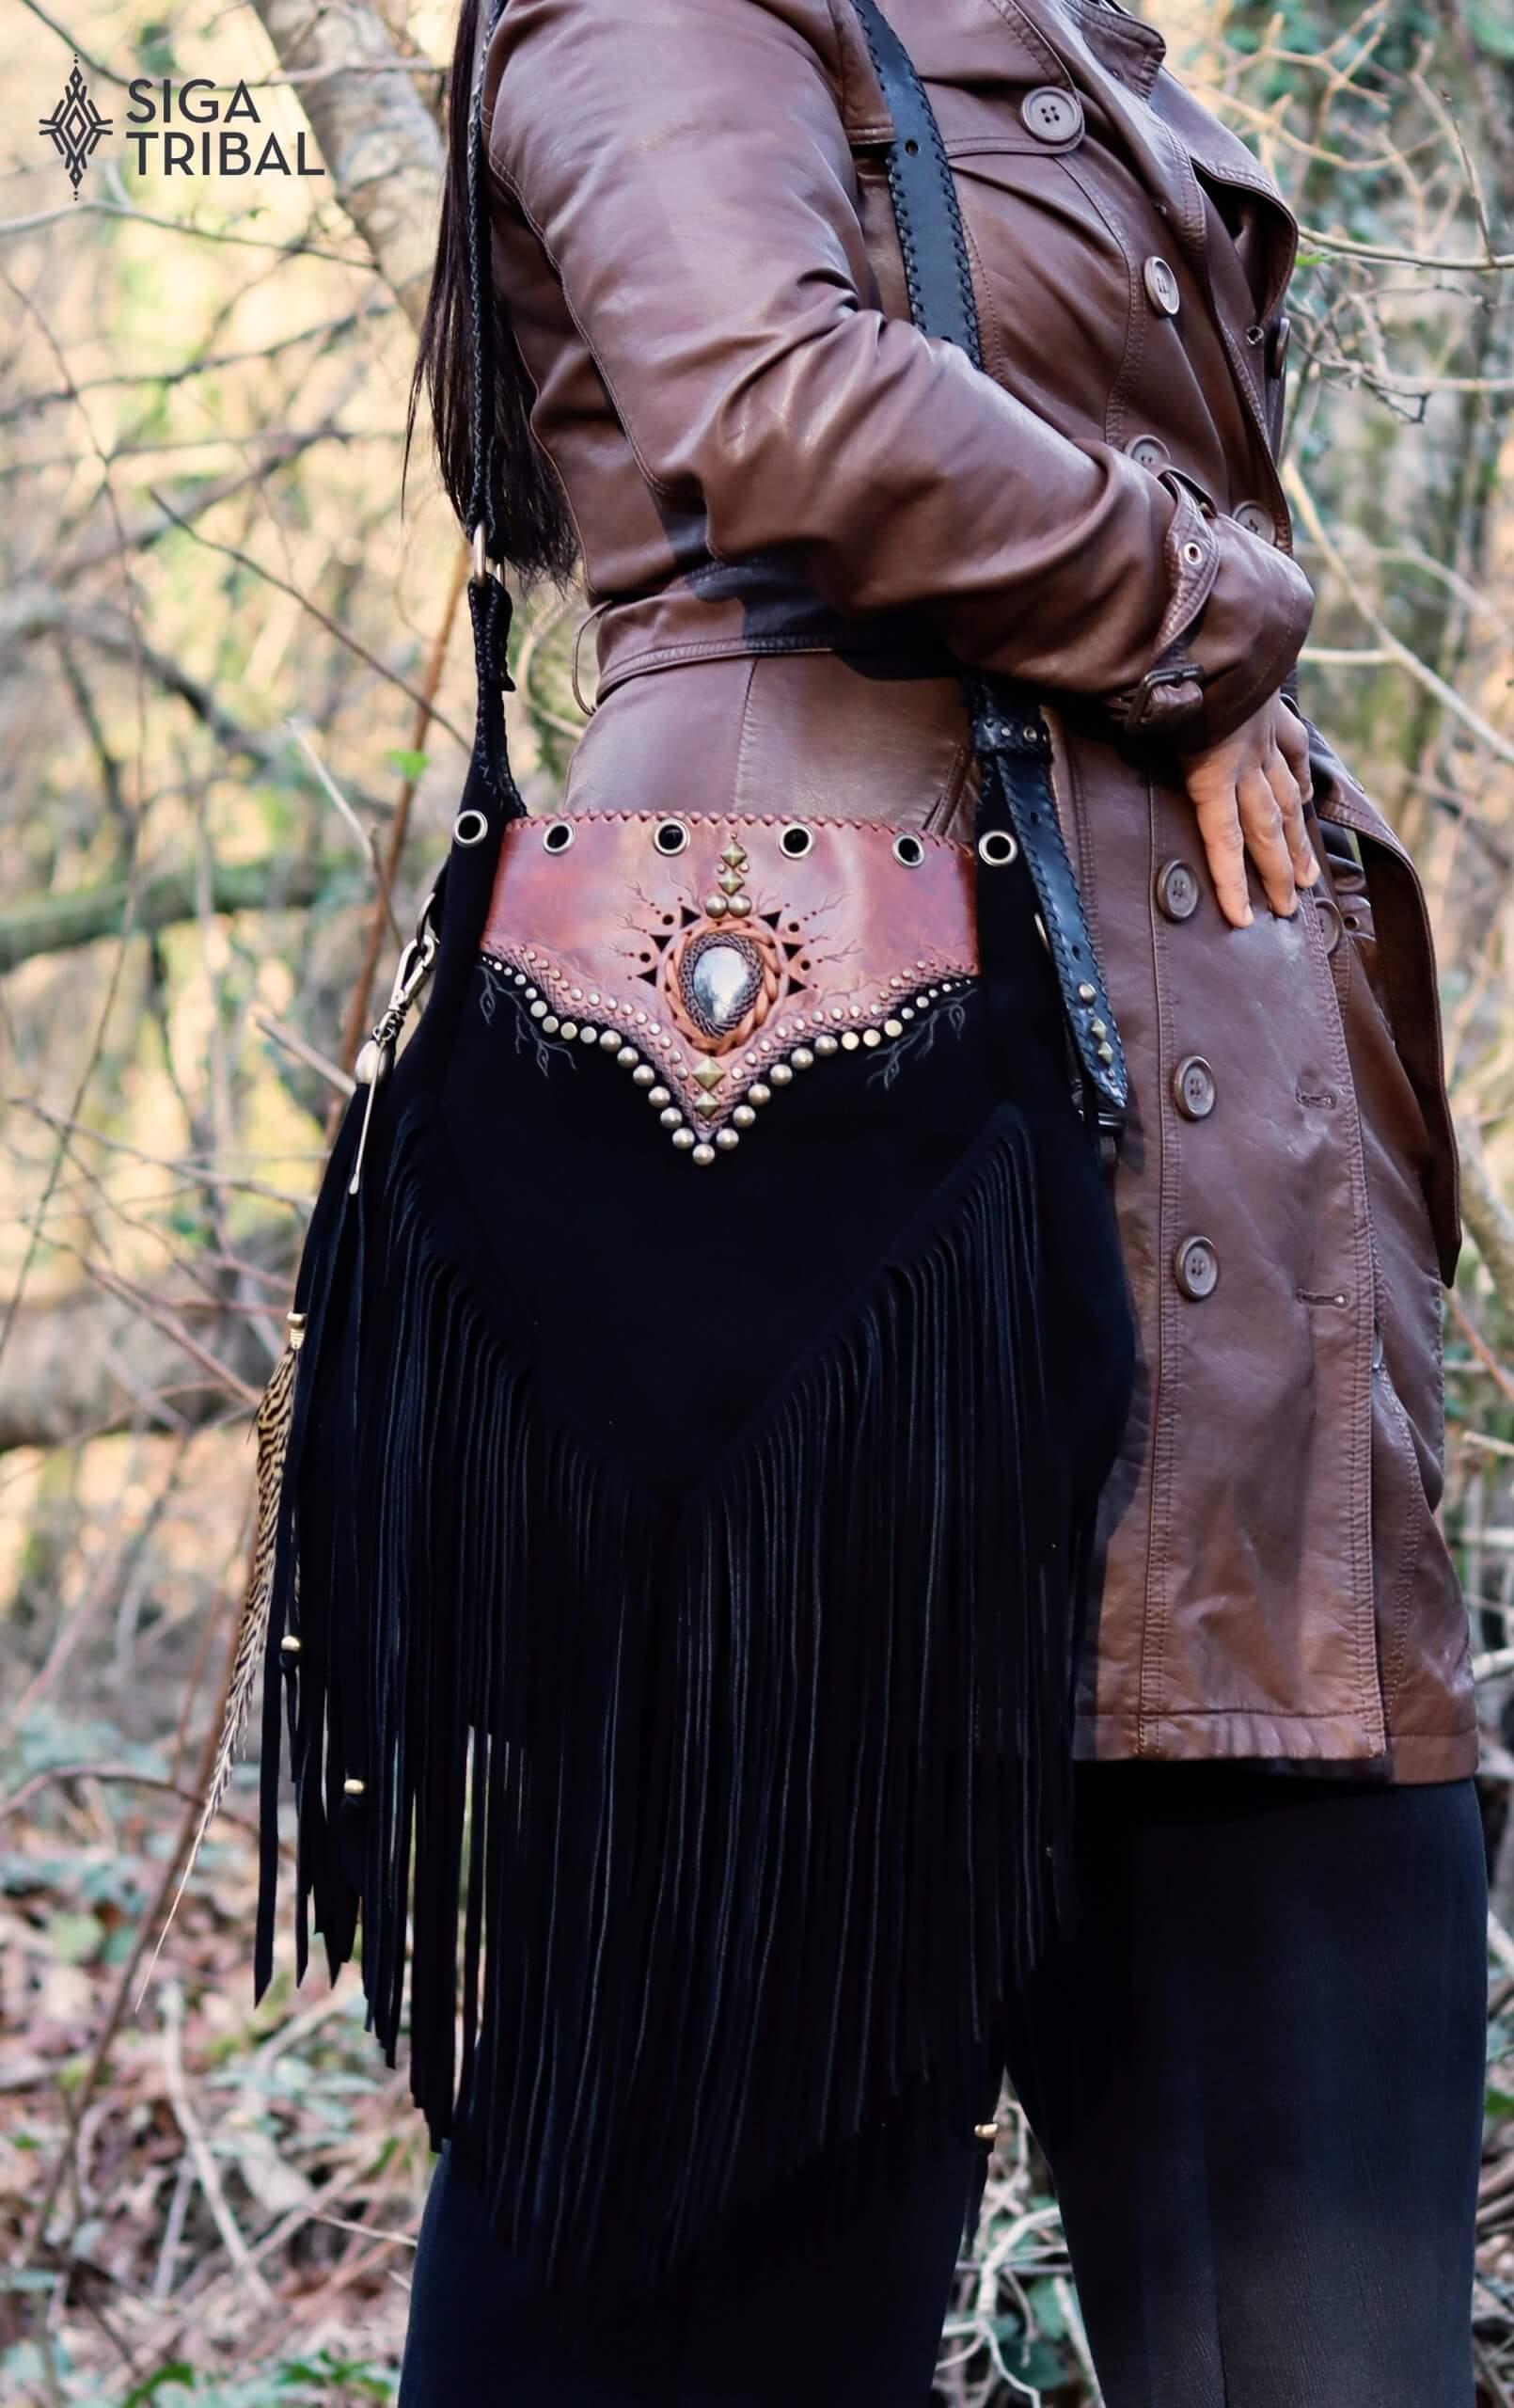 Apache Gold Bag by Siga Tribal